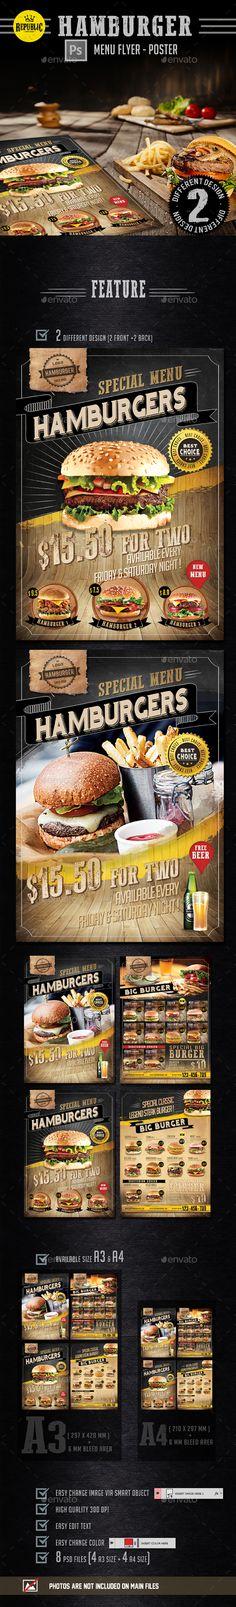 Hamburger Menu Flyer Template PSD. Download here: http://graphicriver.net/item/hamburger-menu-flyer/15474950?ref=ksioks